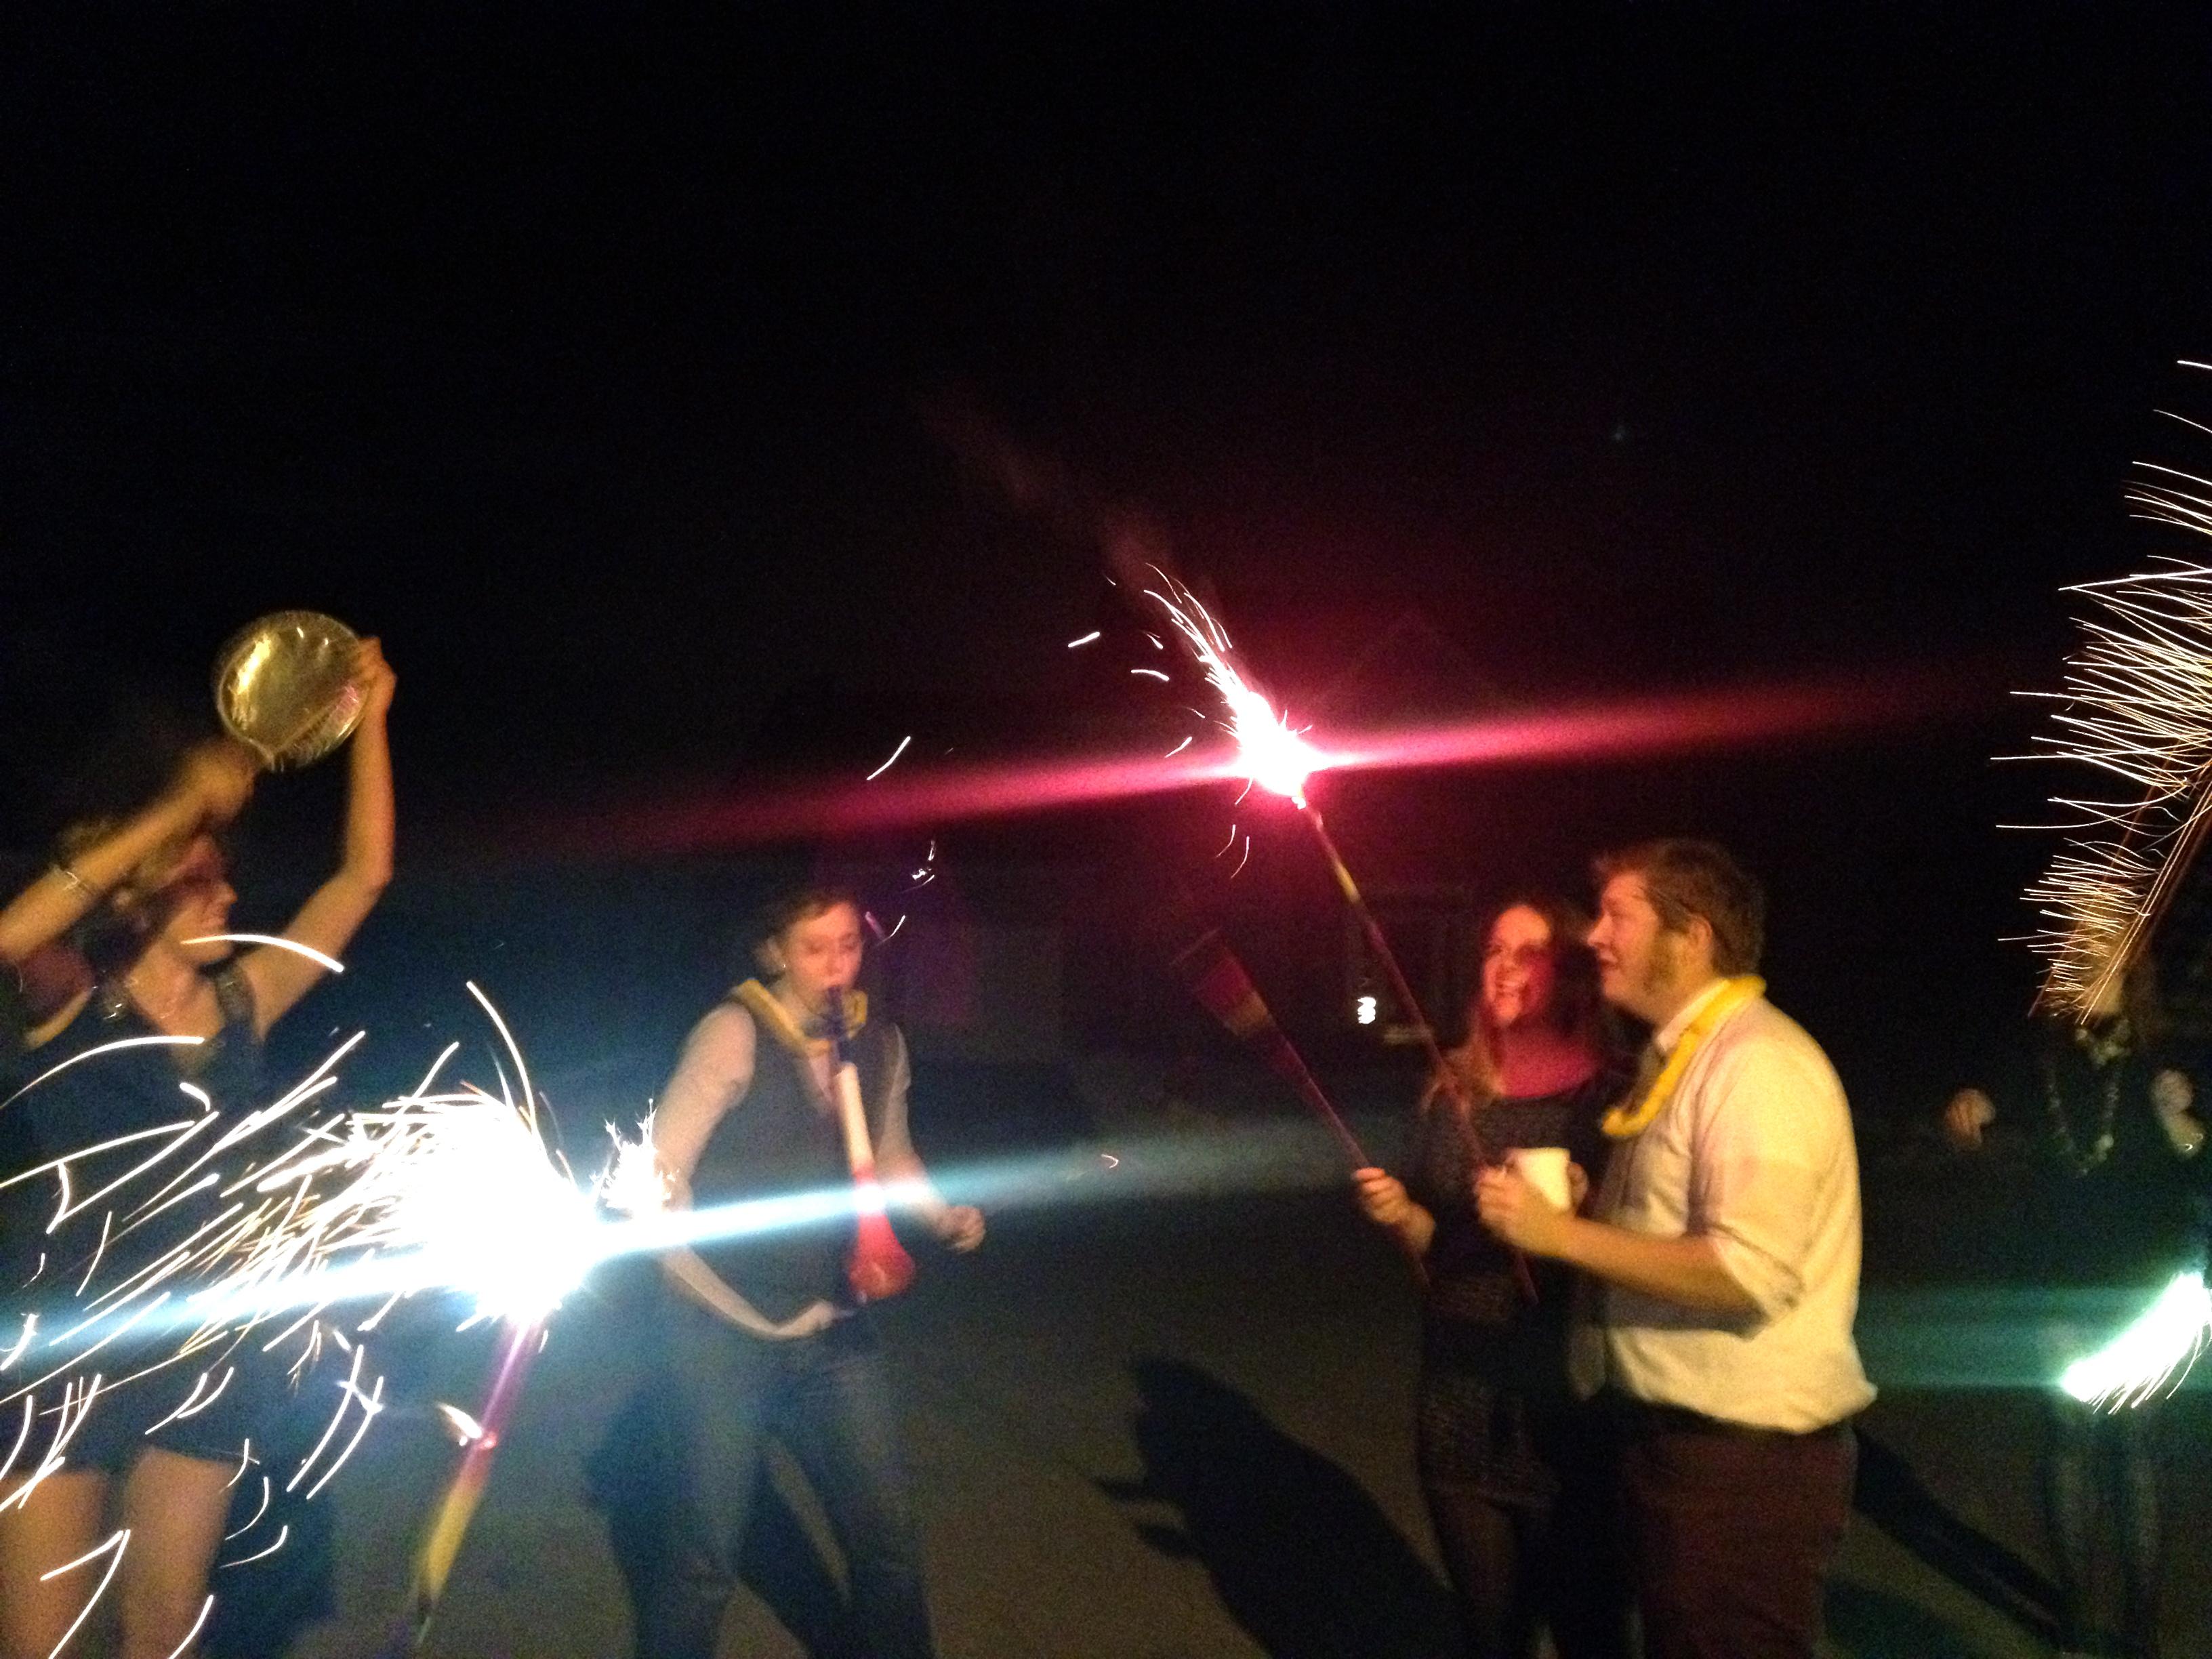 2013 sparklers